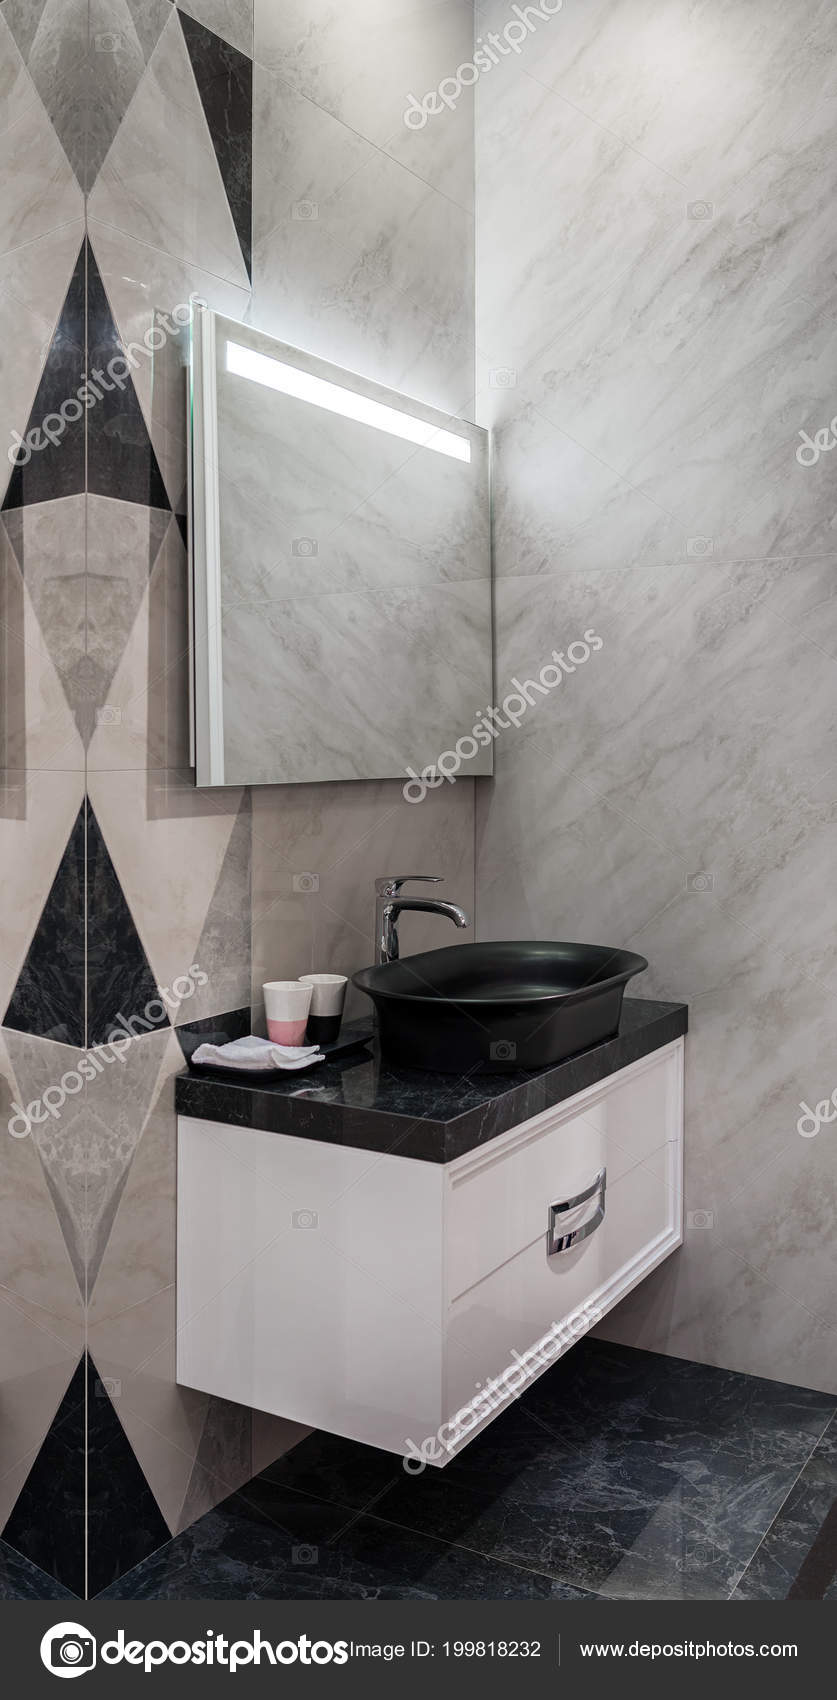 Moderne Badkamer Met Zwarte Wasbak Spiegel Met Led — Stockfoto ...